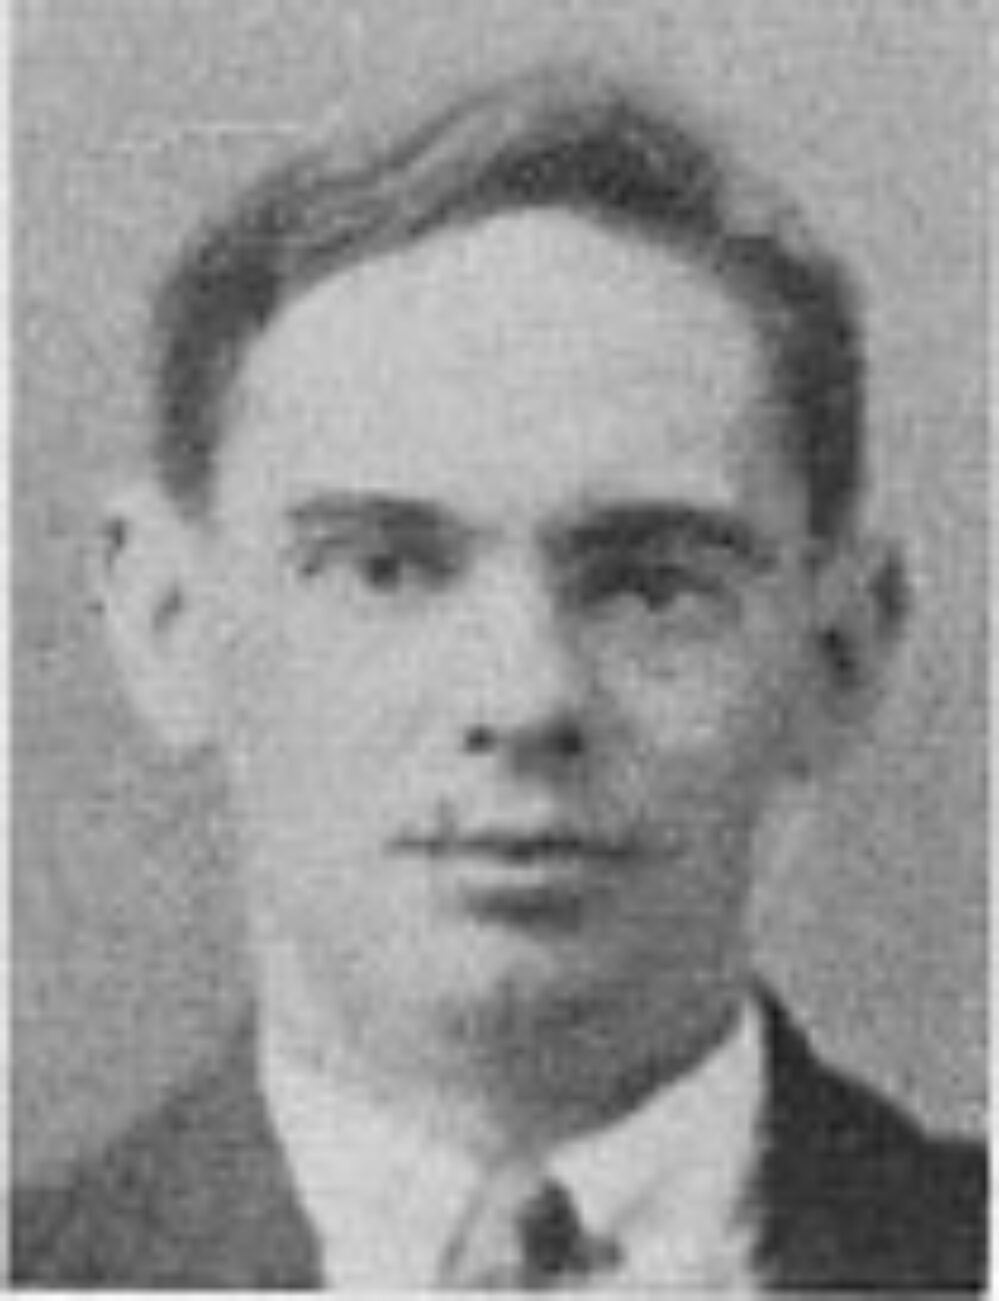 Theodor Løvfald